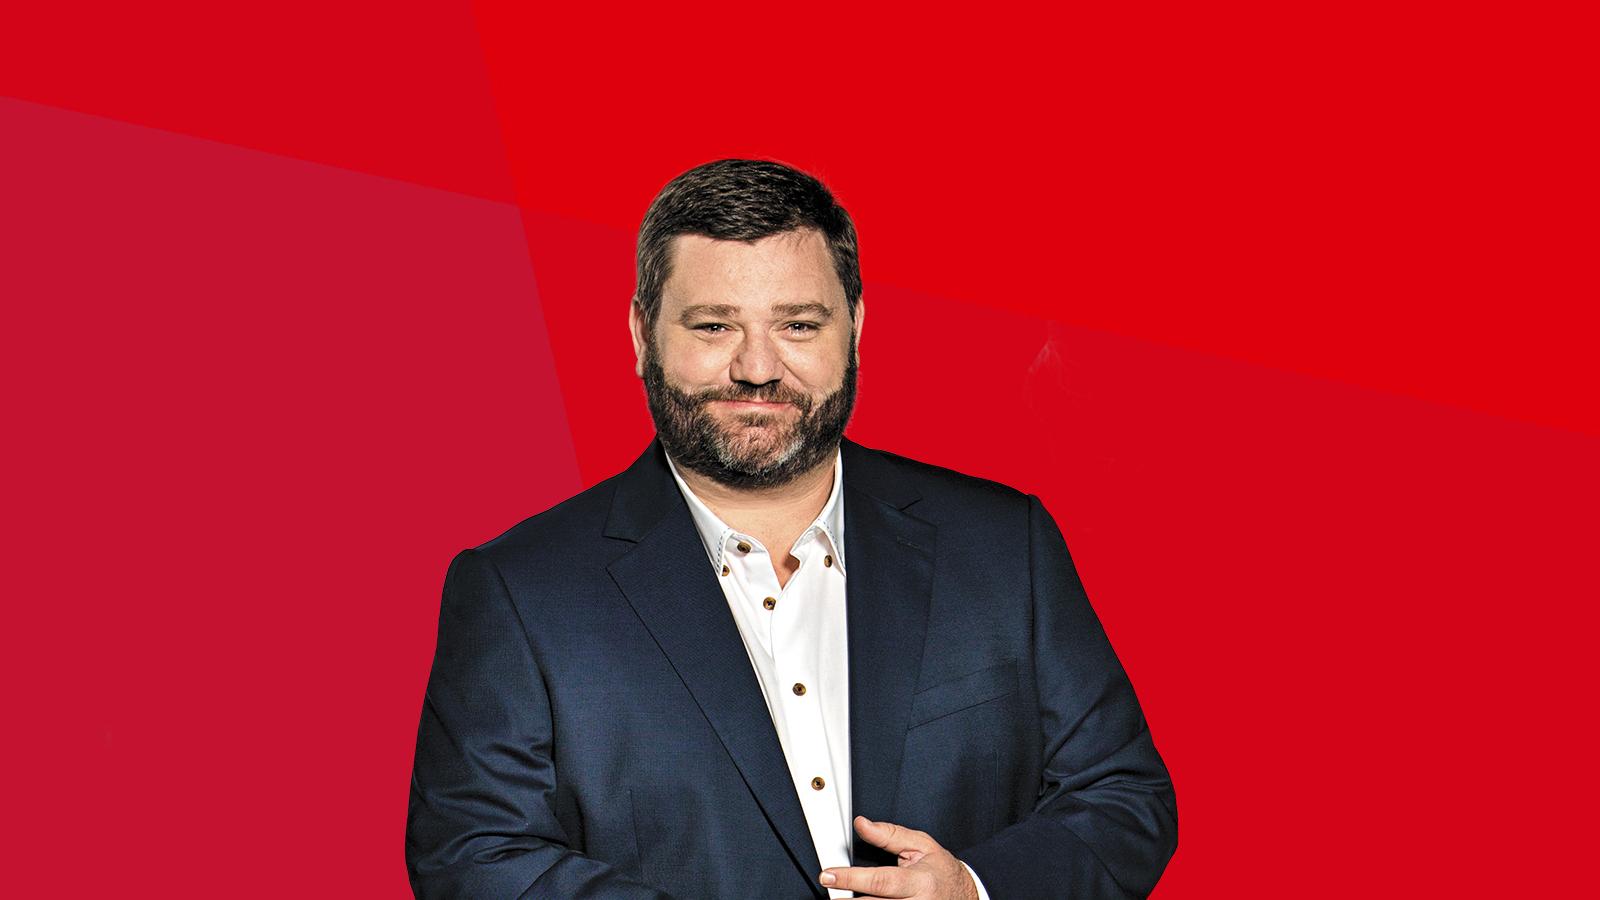 Paul Murray | Sky News Australia